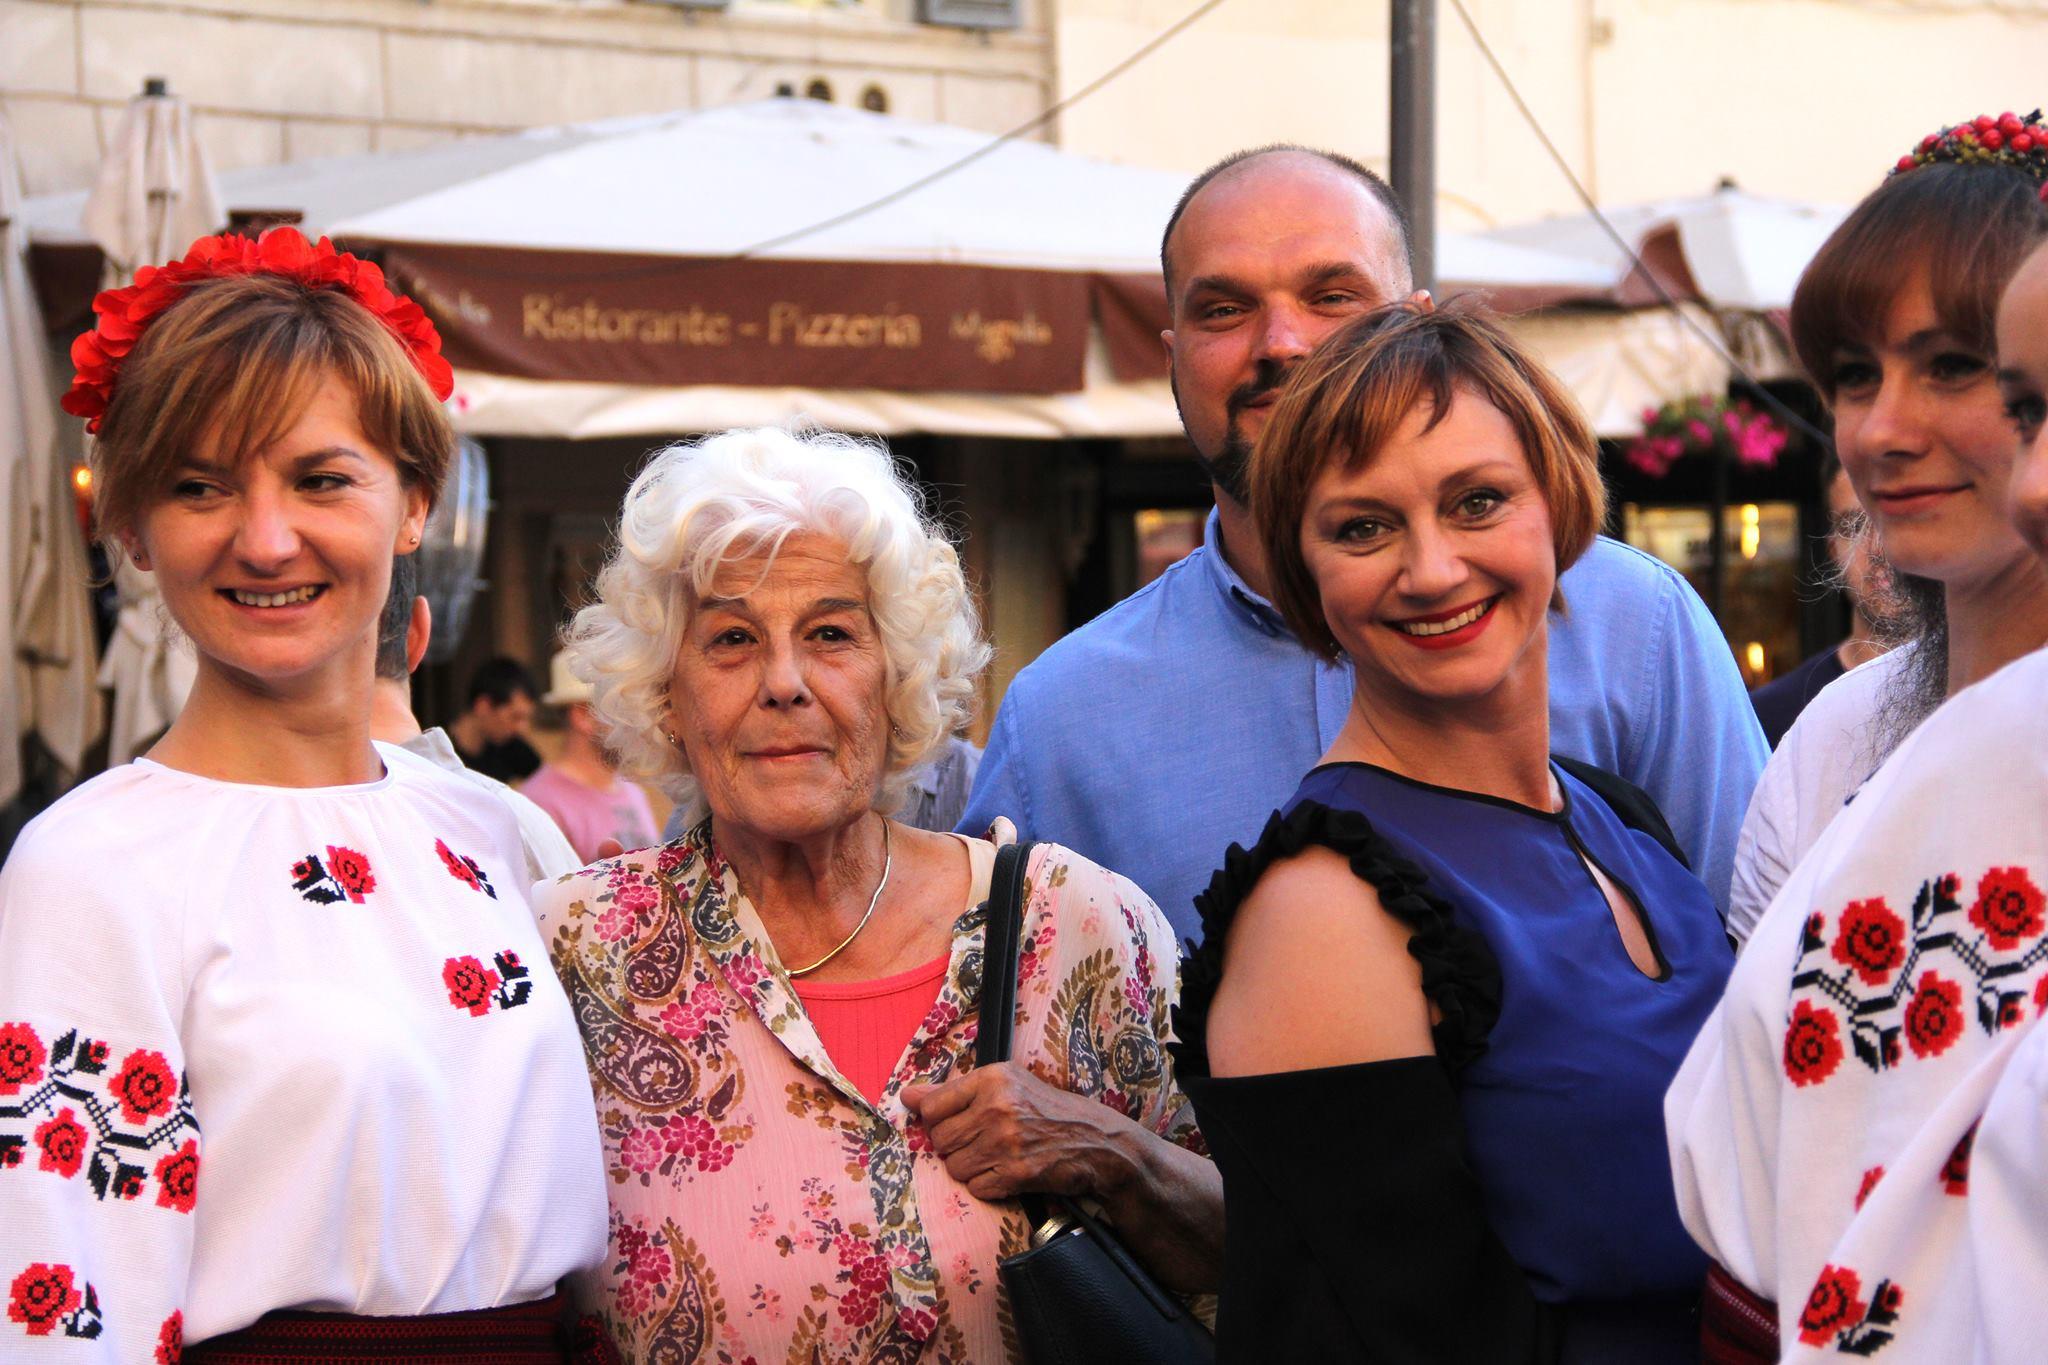 Лина Бернарди, Римма Зюбина и Тарас Ткаченко в окружении украинок в Риме